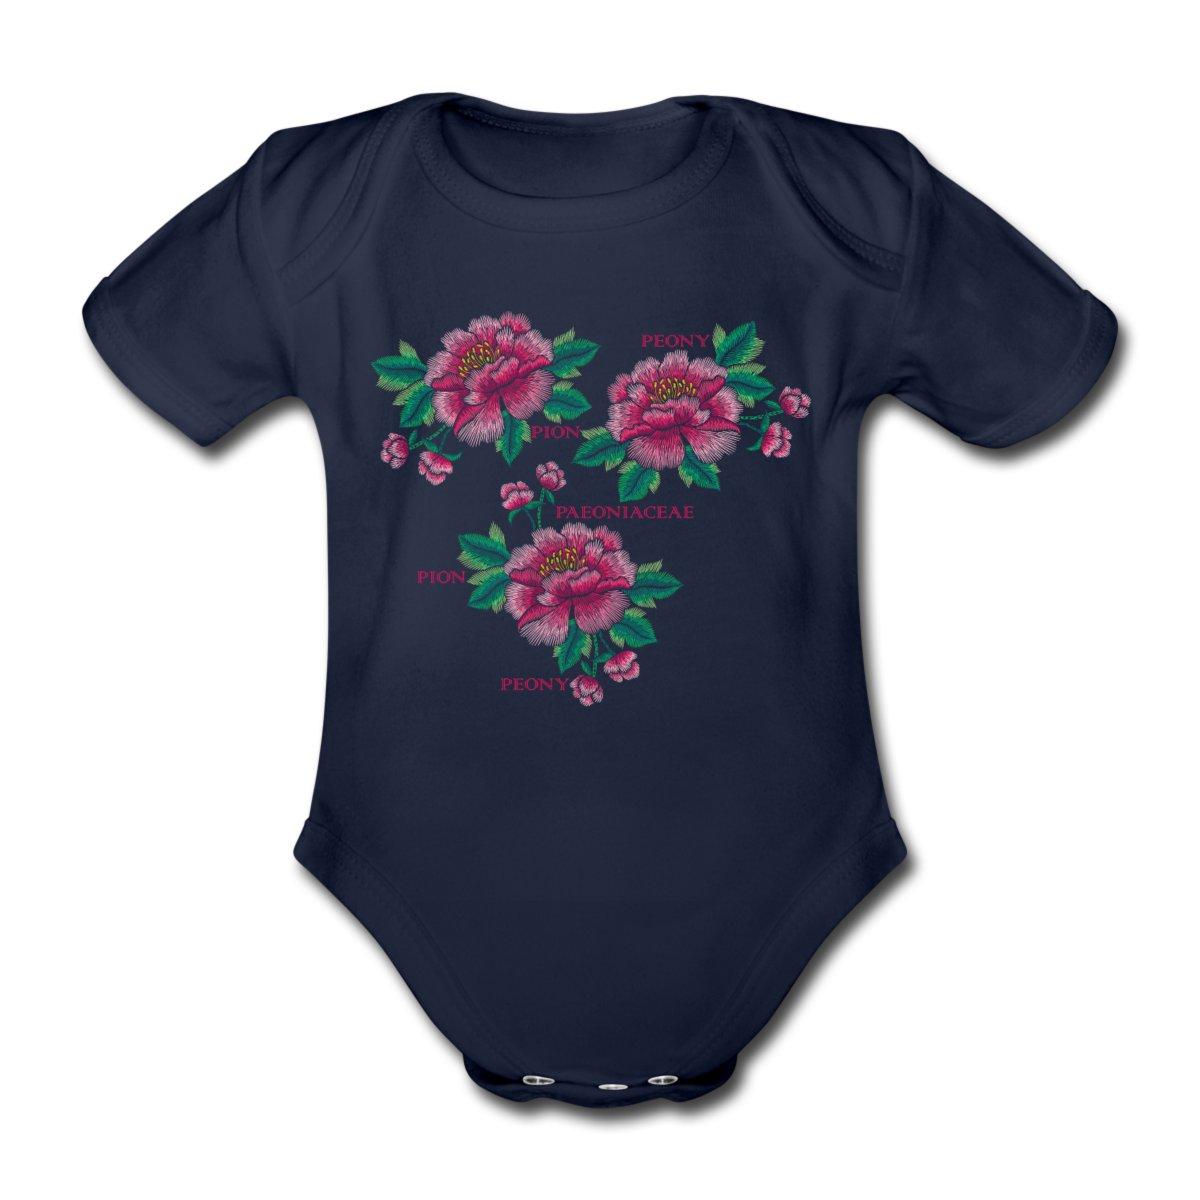 pion-ekologisk-kortaermad-babybody-marin.jpg